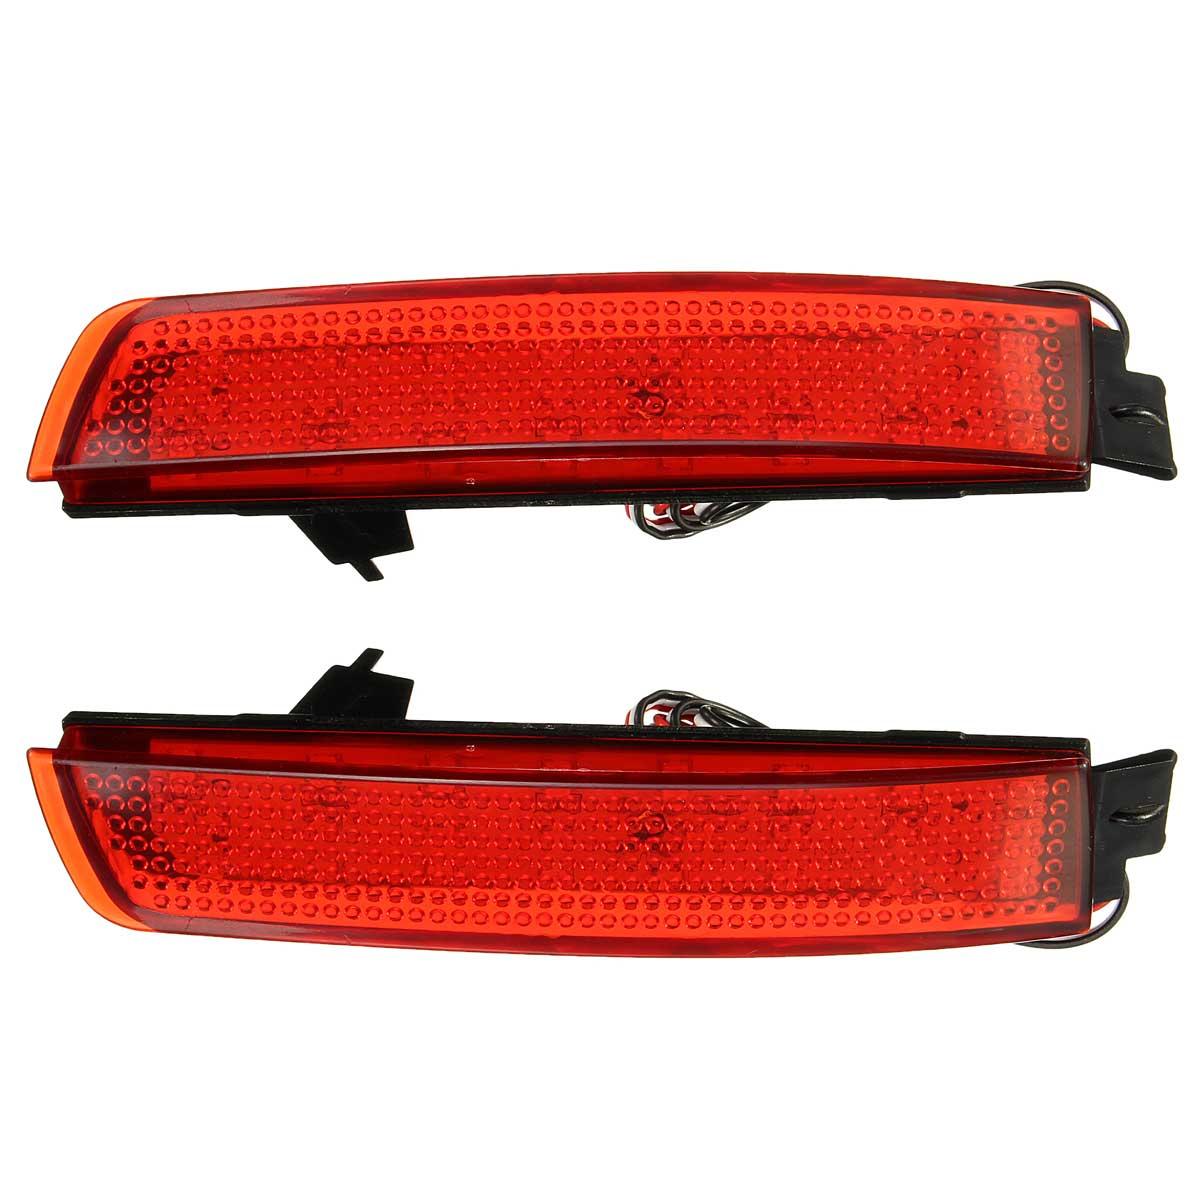 2 Pcs Car LED Rear Bumper Reflector Tail Brake Light For Infiniti FX37/35/50/Nissan/Sentra/Juke/Murano/Quest rear bumper reflector light for nissan juke murano sentra quest infiniti fx35 fx37 fx50 led red fog parking brake tail lamp